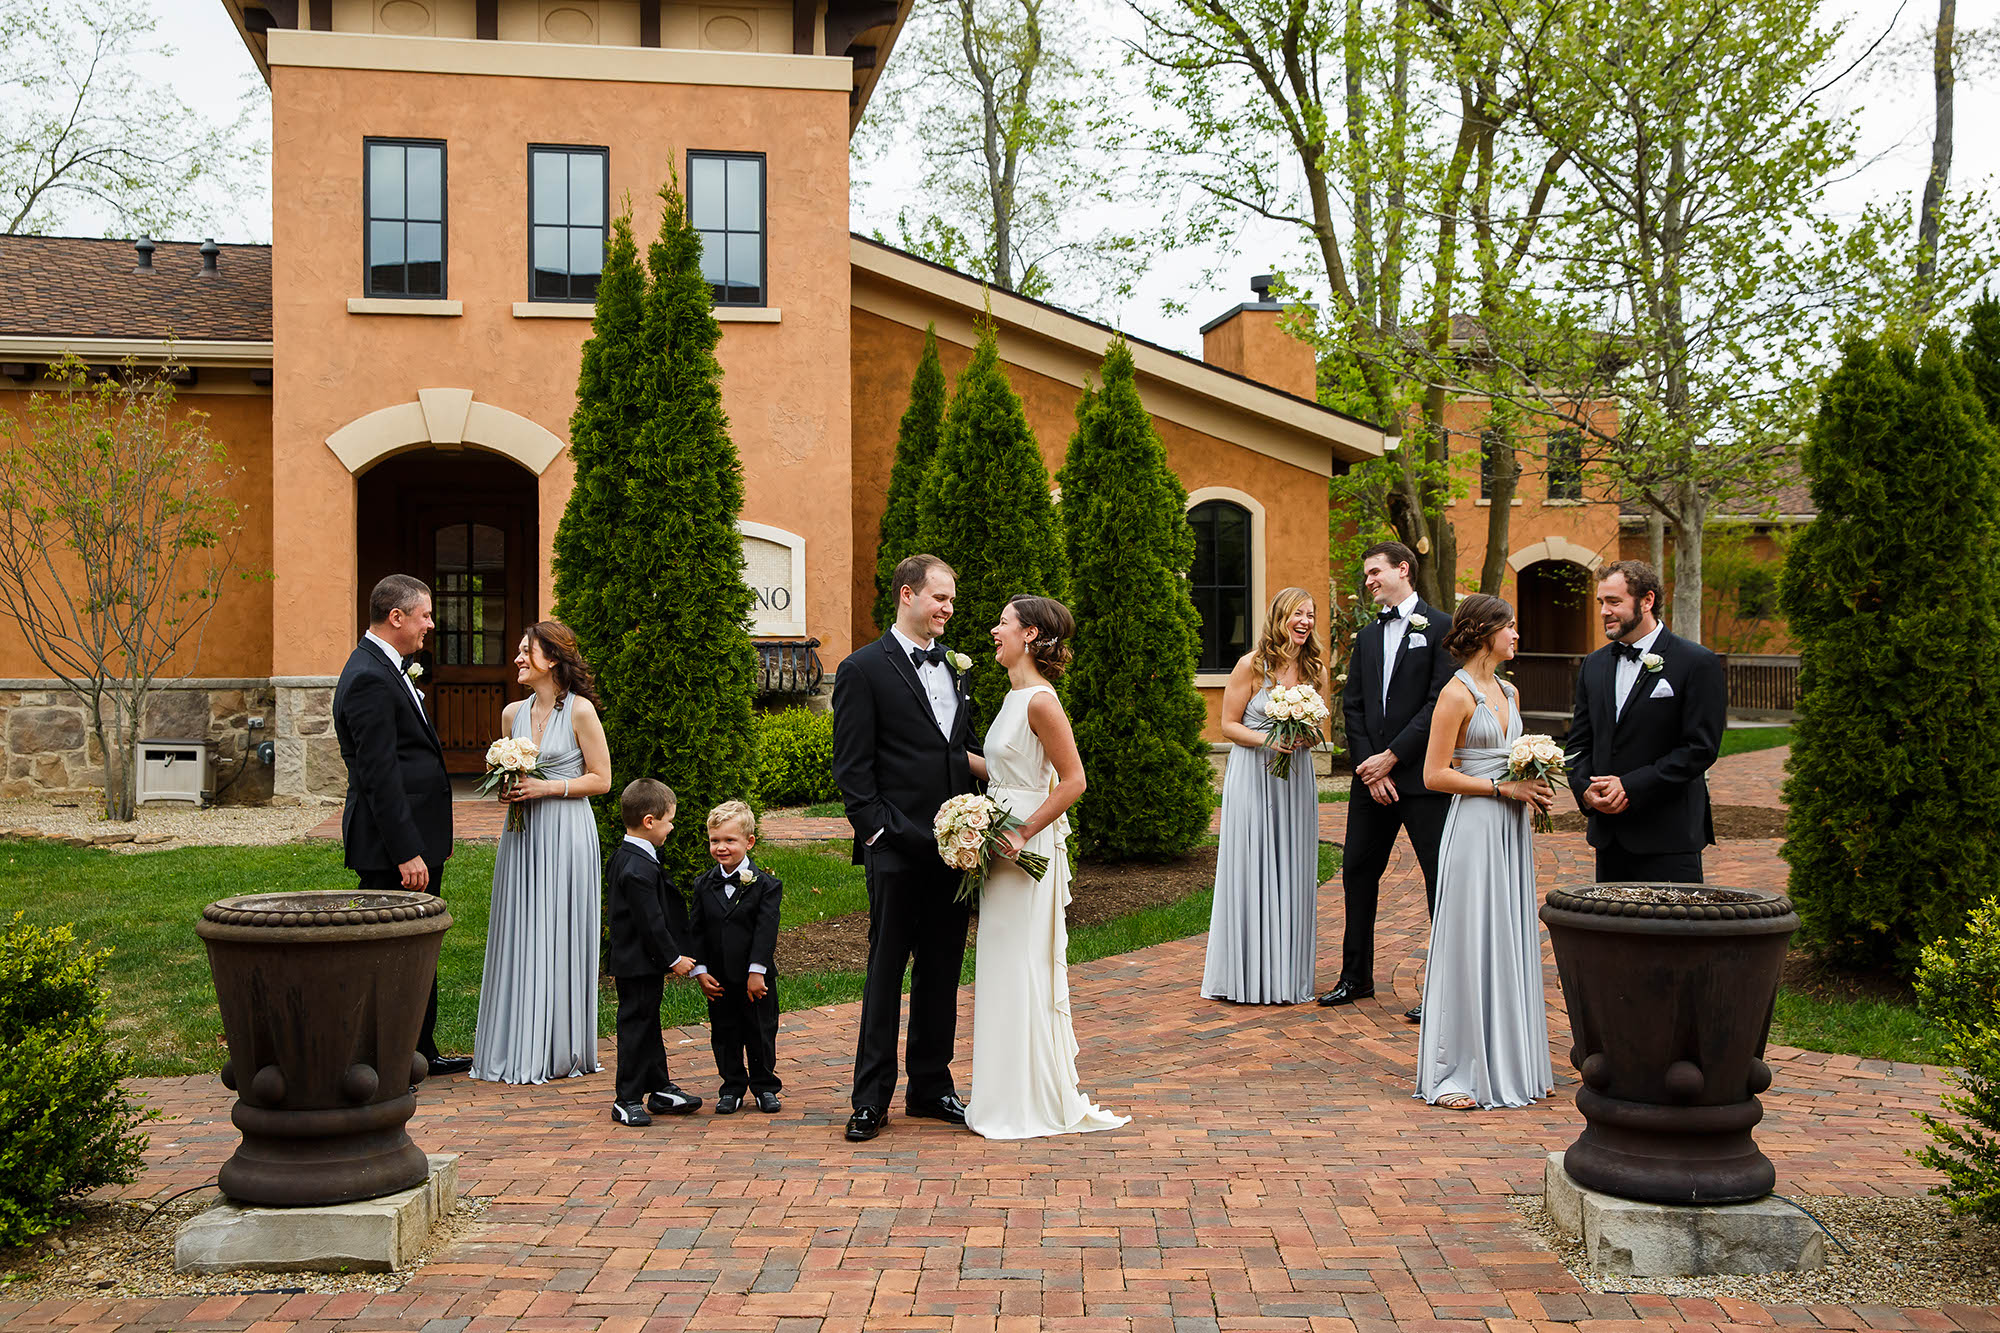 Canton, Copyright Genevieve Nisly Photography, Gervasi Vineyard, Ohio, Spring, Wedding, Category|Wedding, Seasons|Spring, Venues|Ohio, Venues|Ohio|Canton, Venues|Ohio|Canton|Gervasi Vineyard